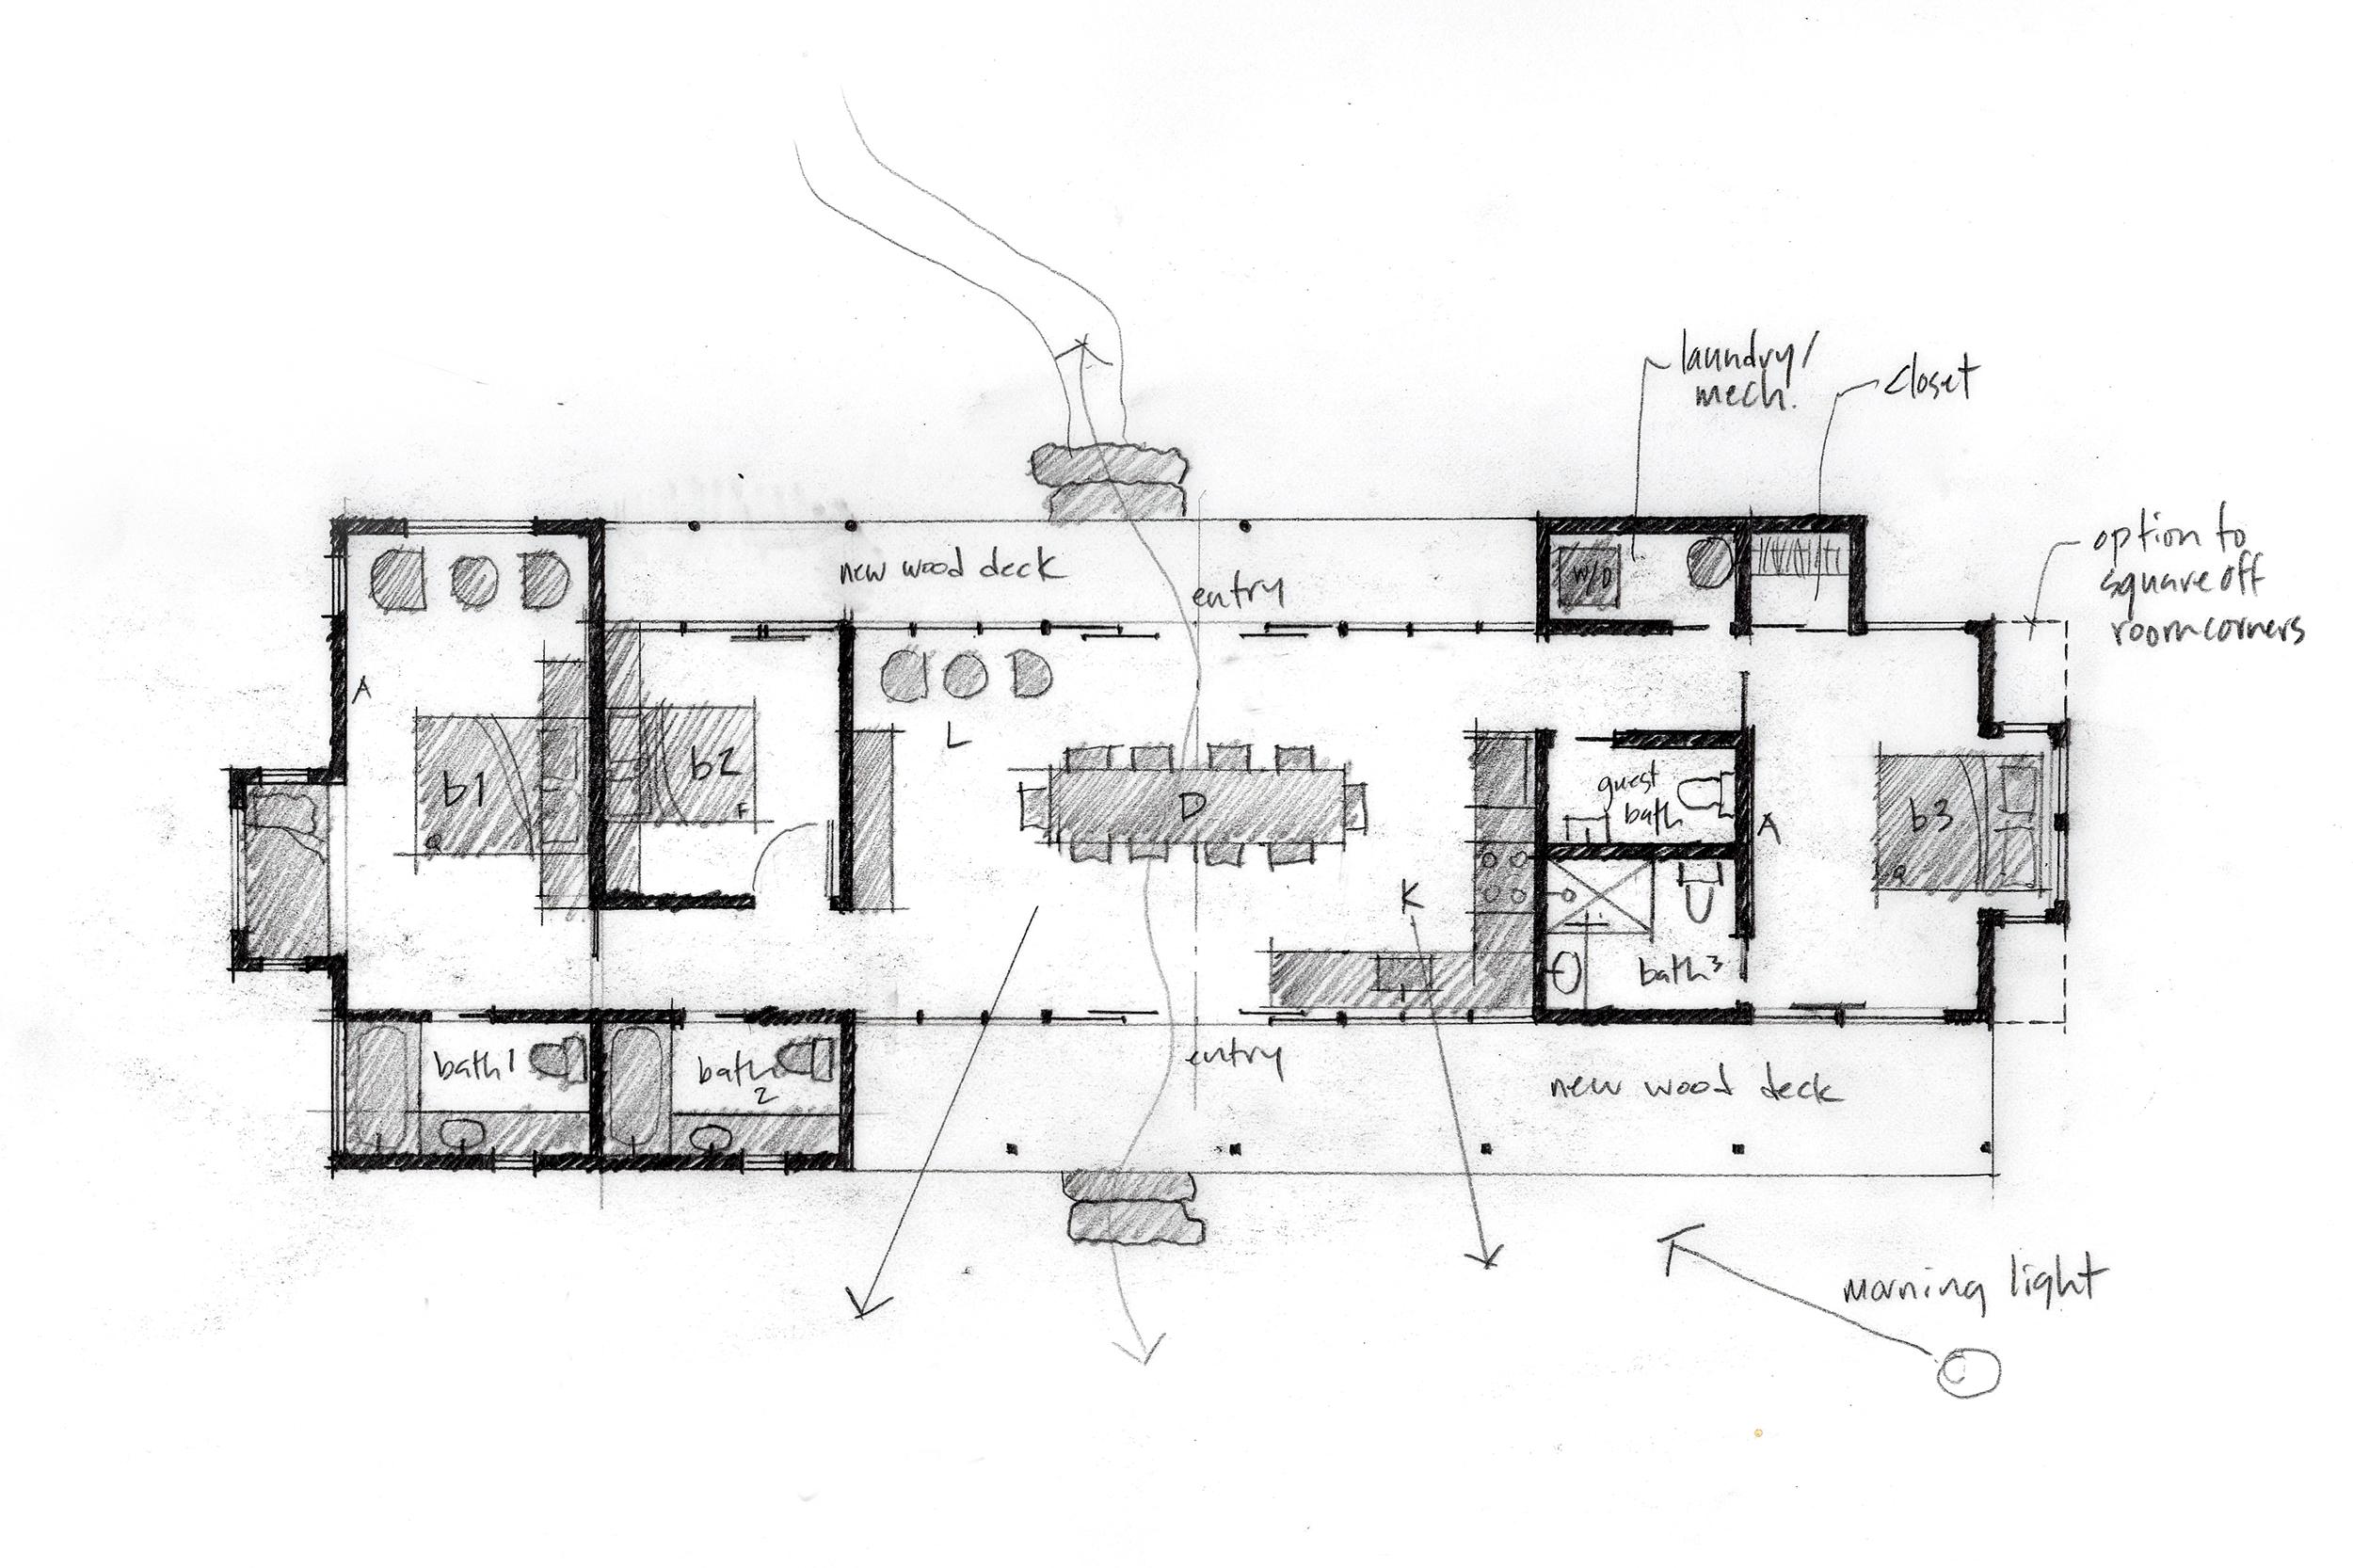 goCstudio_Island Cabin_Drawing 1.JPG